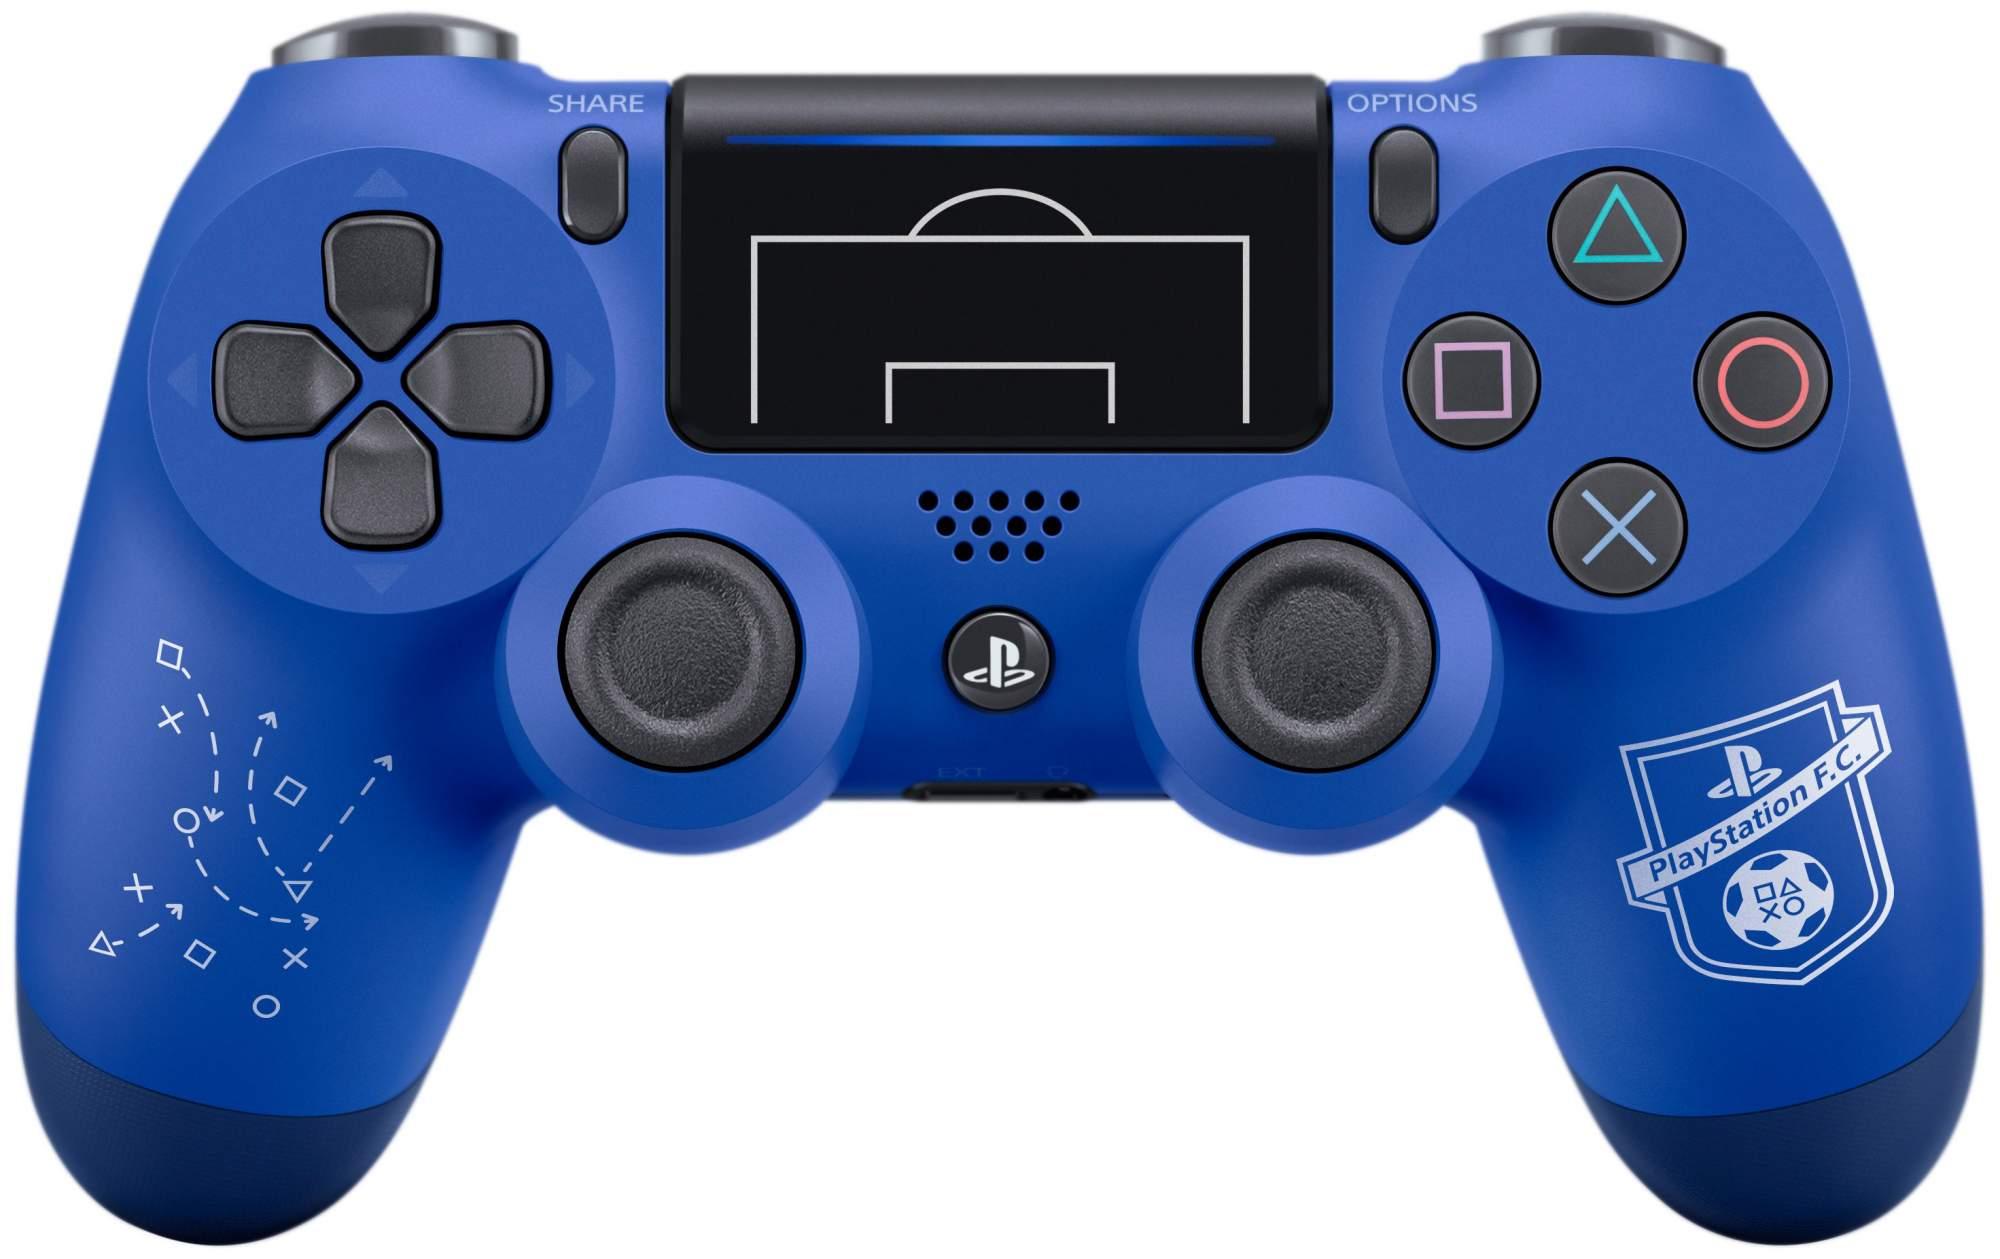 Геймпад Sony PlayStation Dualshock 4 Dualshock 4 v2 CUH-ZCT2E F.C